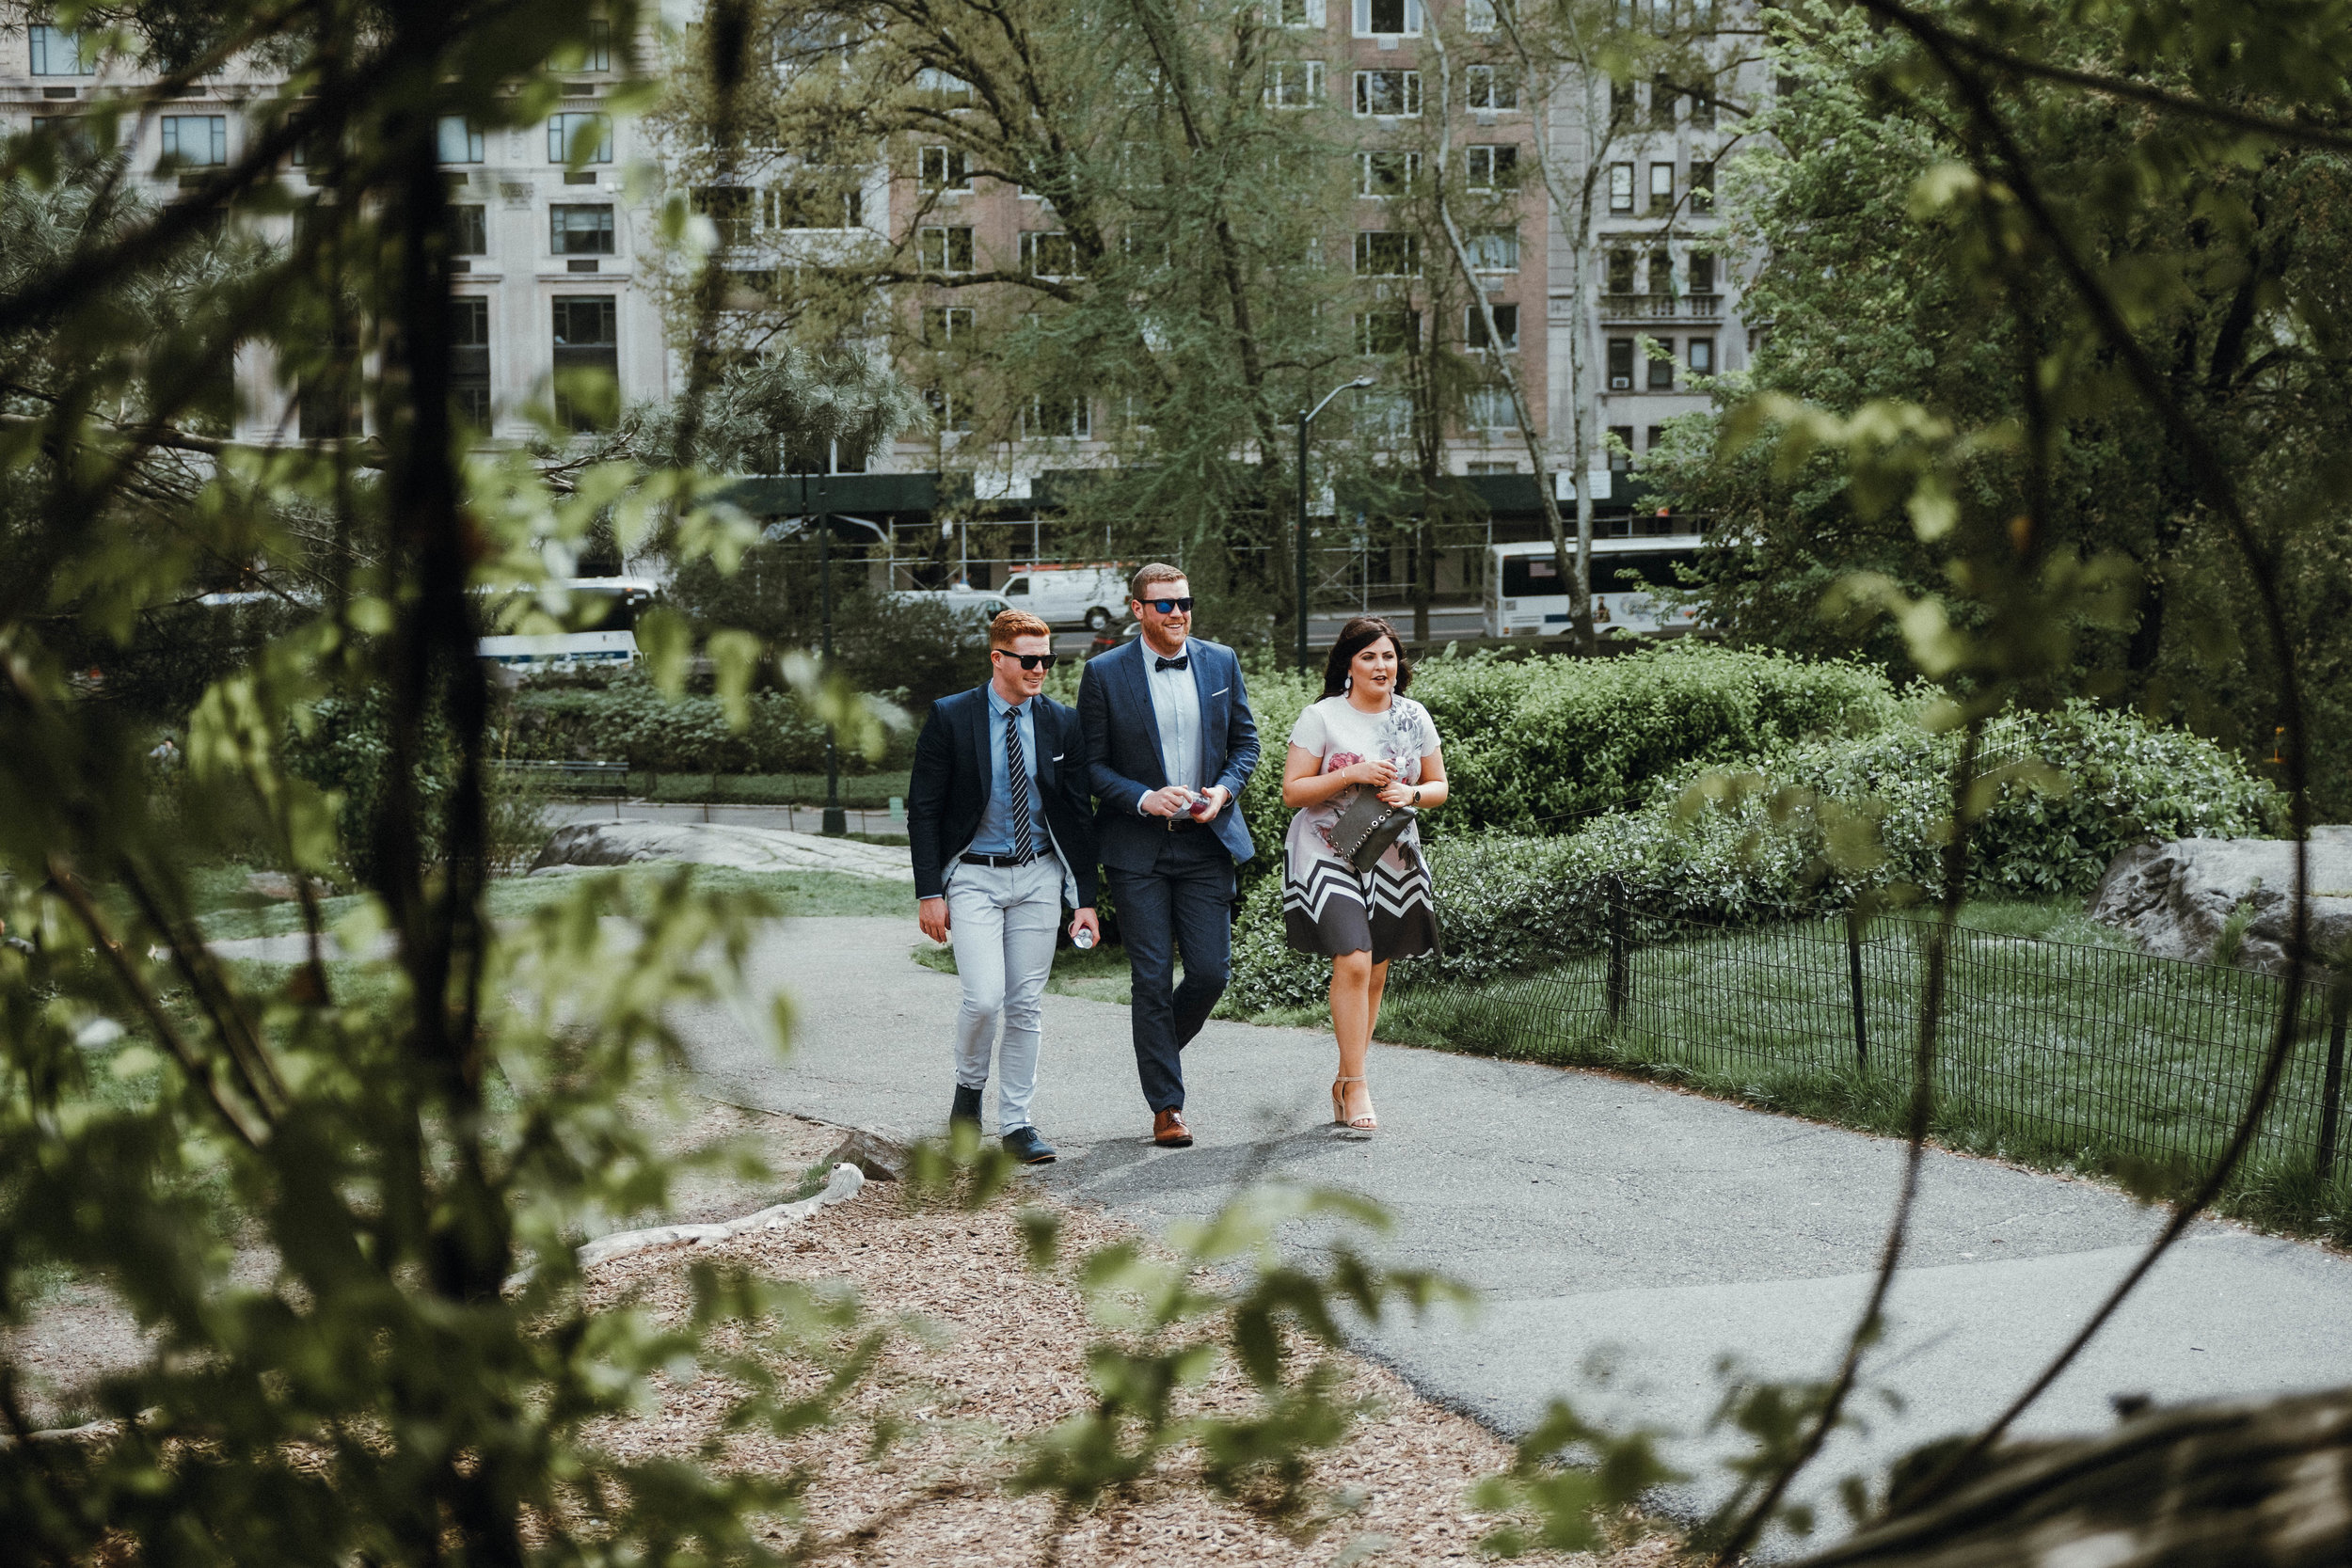 Cop Cot Central Park wedding guests